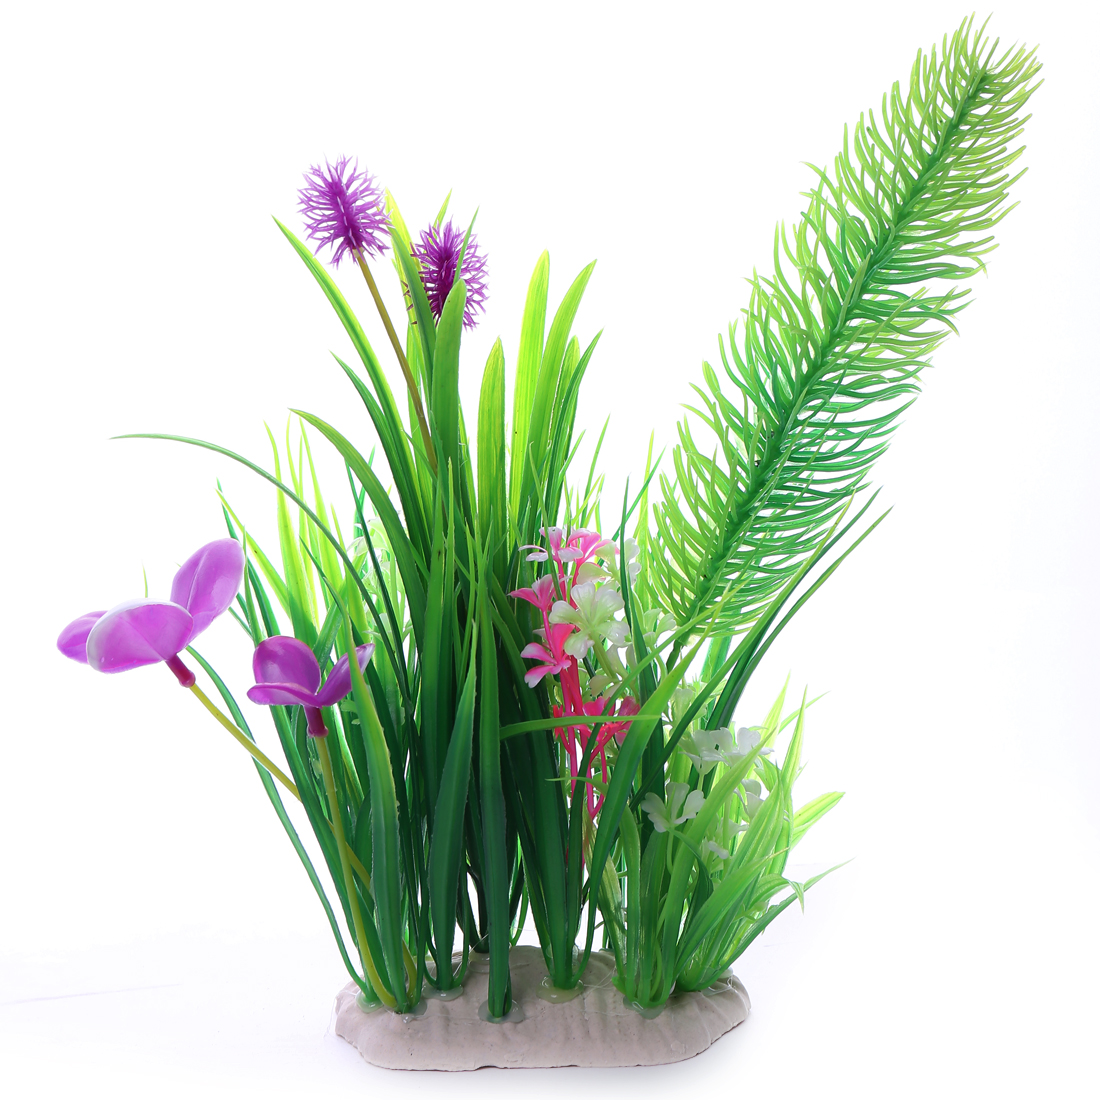 28cm long Multi Color Underwater Plastic Aquarium Decoration Plants Flower